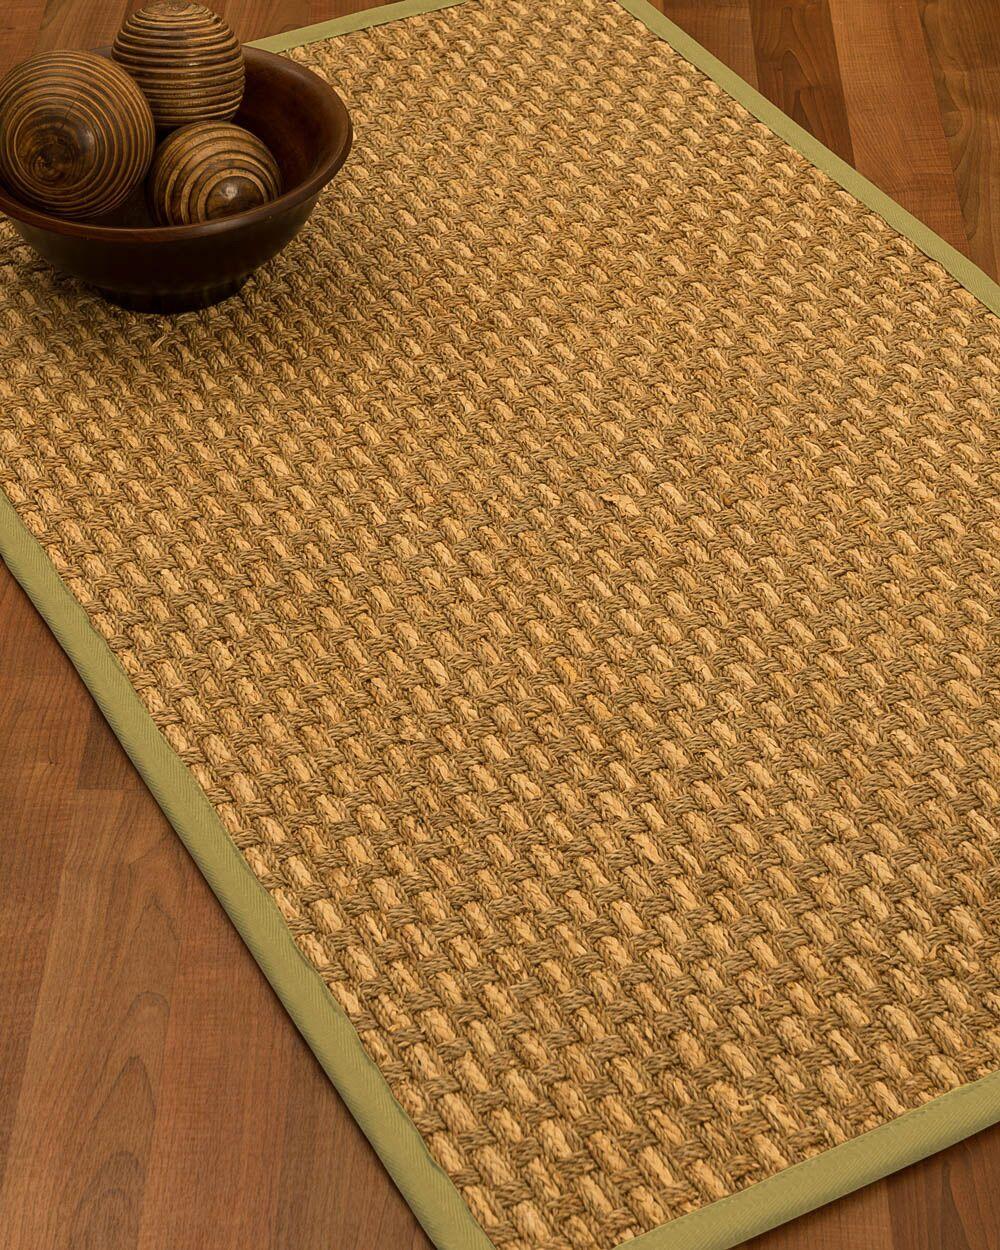 Castiglia Border Hand-Woven Beige/Khaki Area Rug Rug Size: Rectangle 5' x 8', Rug Pad Included: Yes